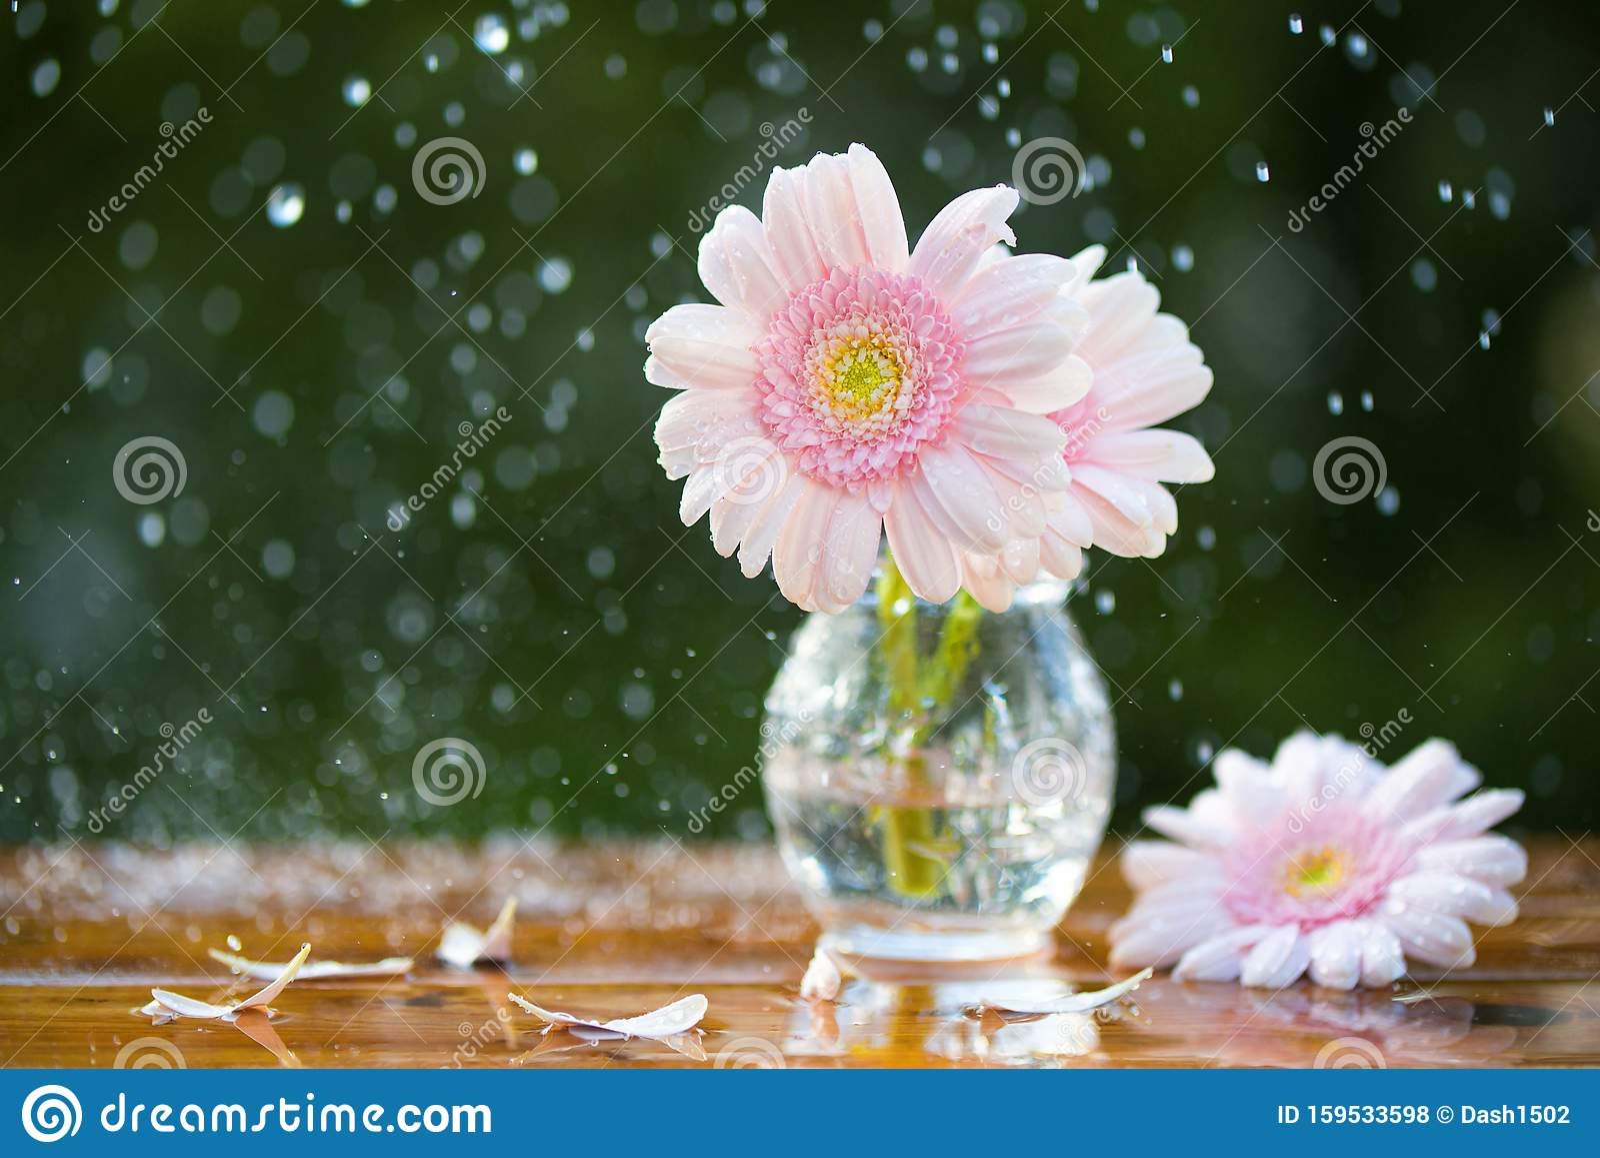 Pink Gerbera Daisy Flowers In Vase Under The Rain On ...